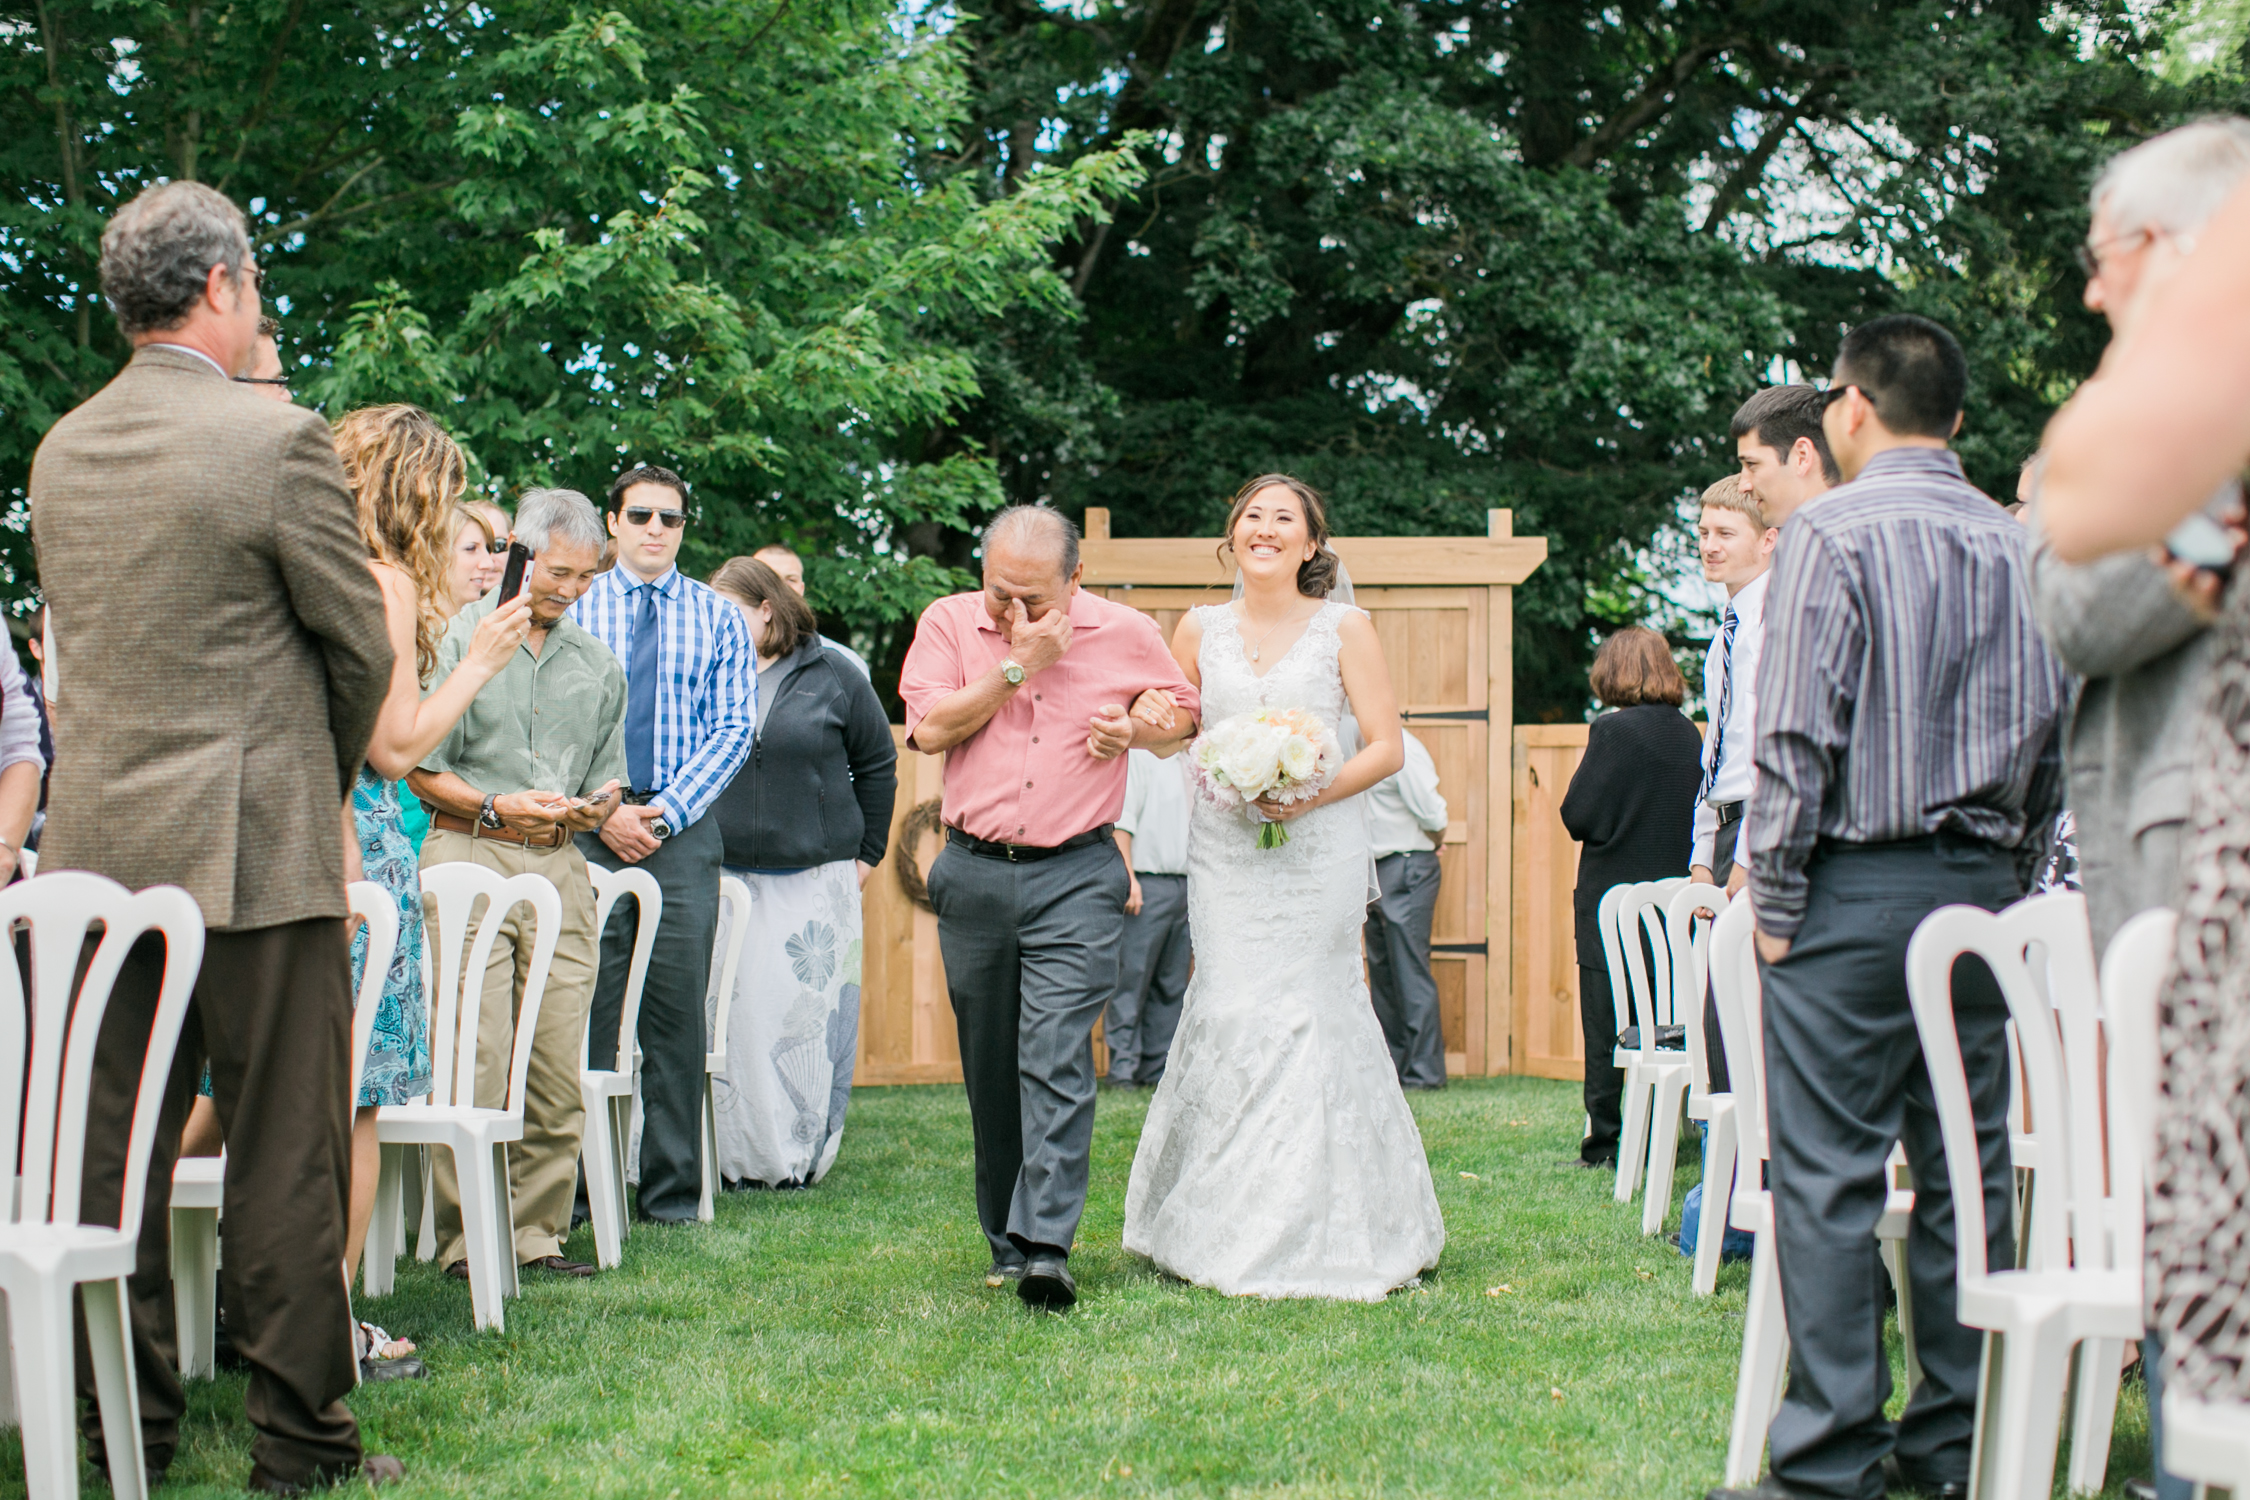 Postlewaits Oregon Wedding by Michelle Cross-20.jpg